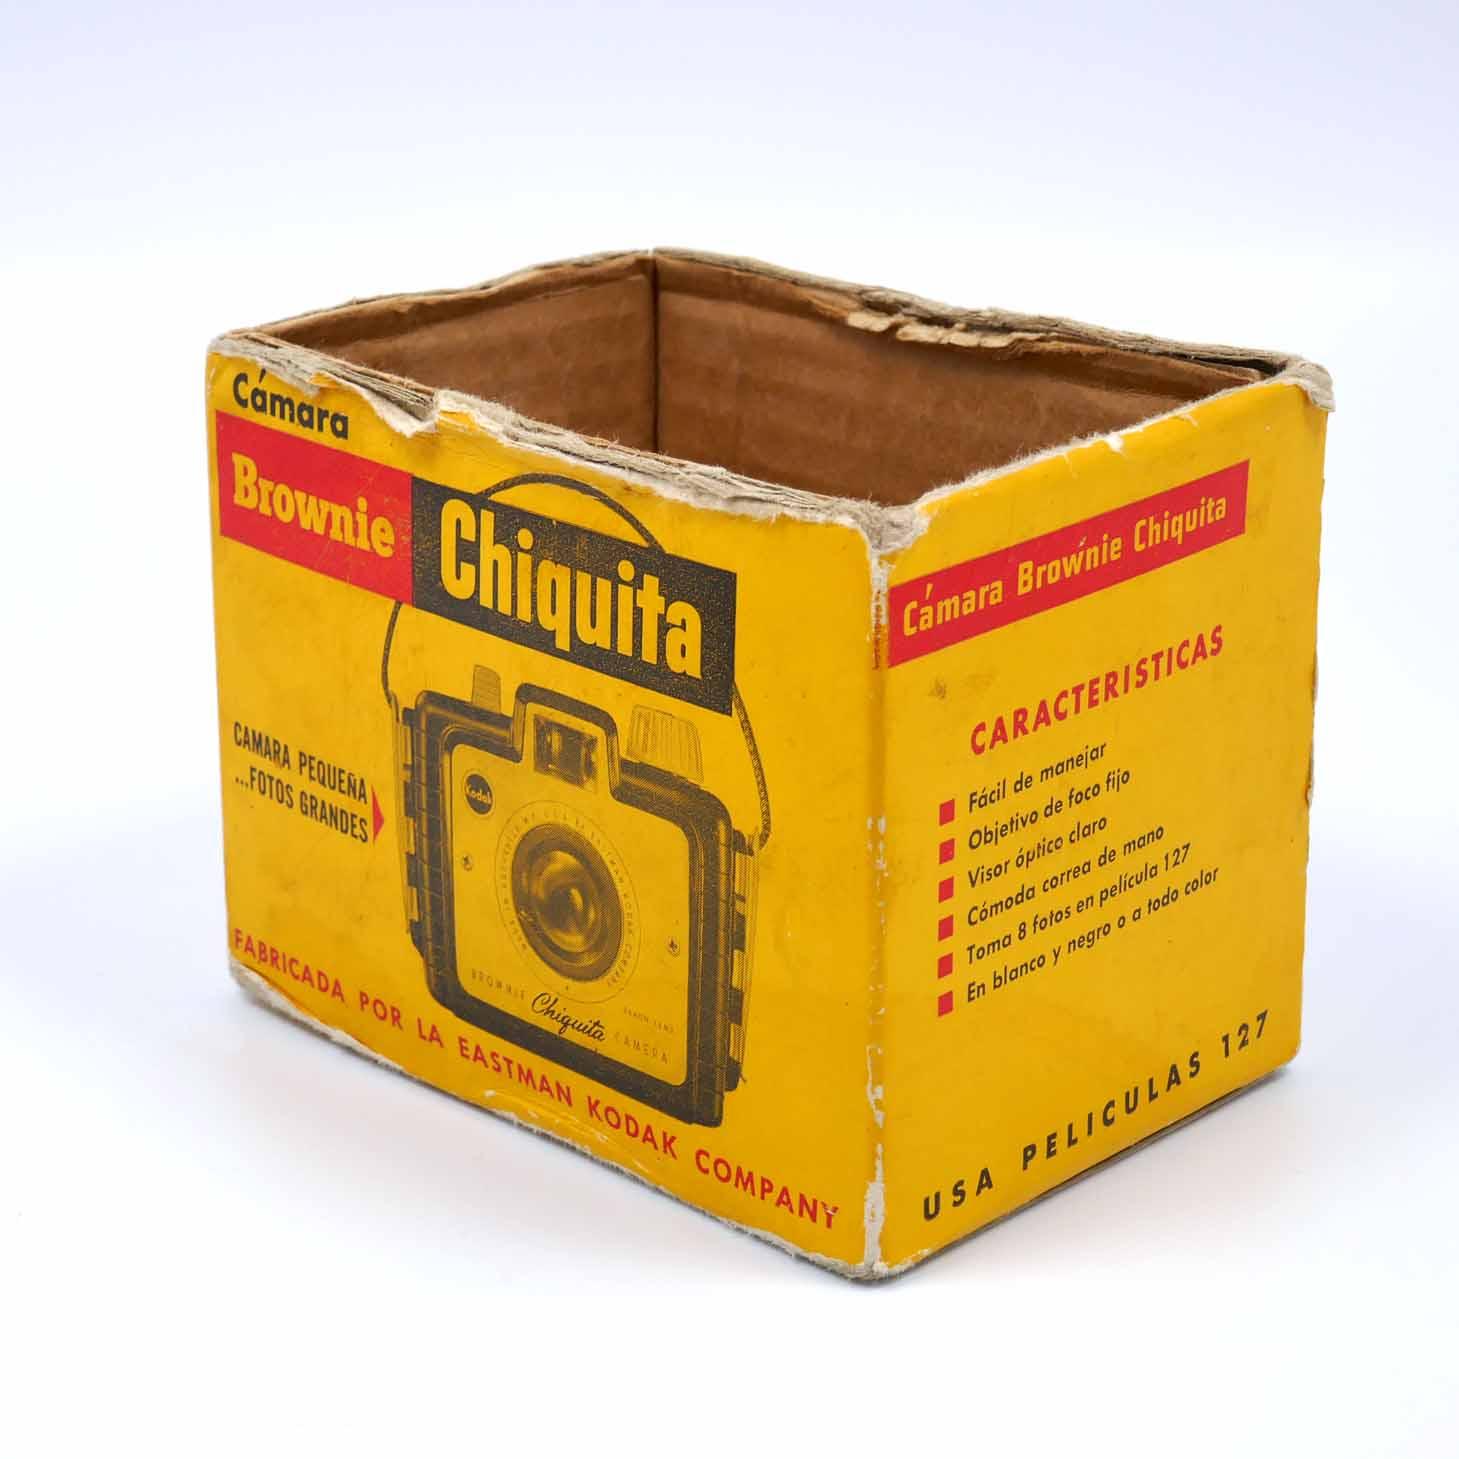 clean-cameras-Kodak-Box-Brownie-Chiquita-02